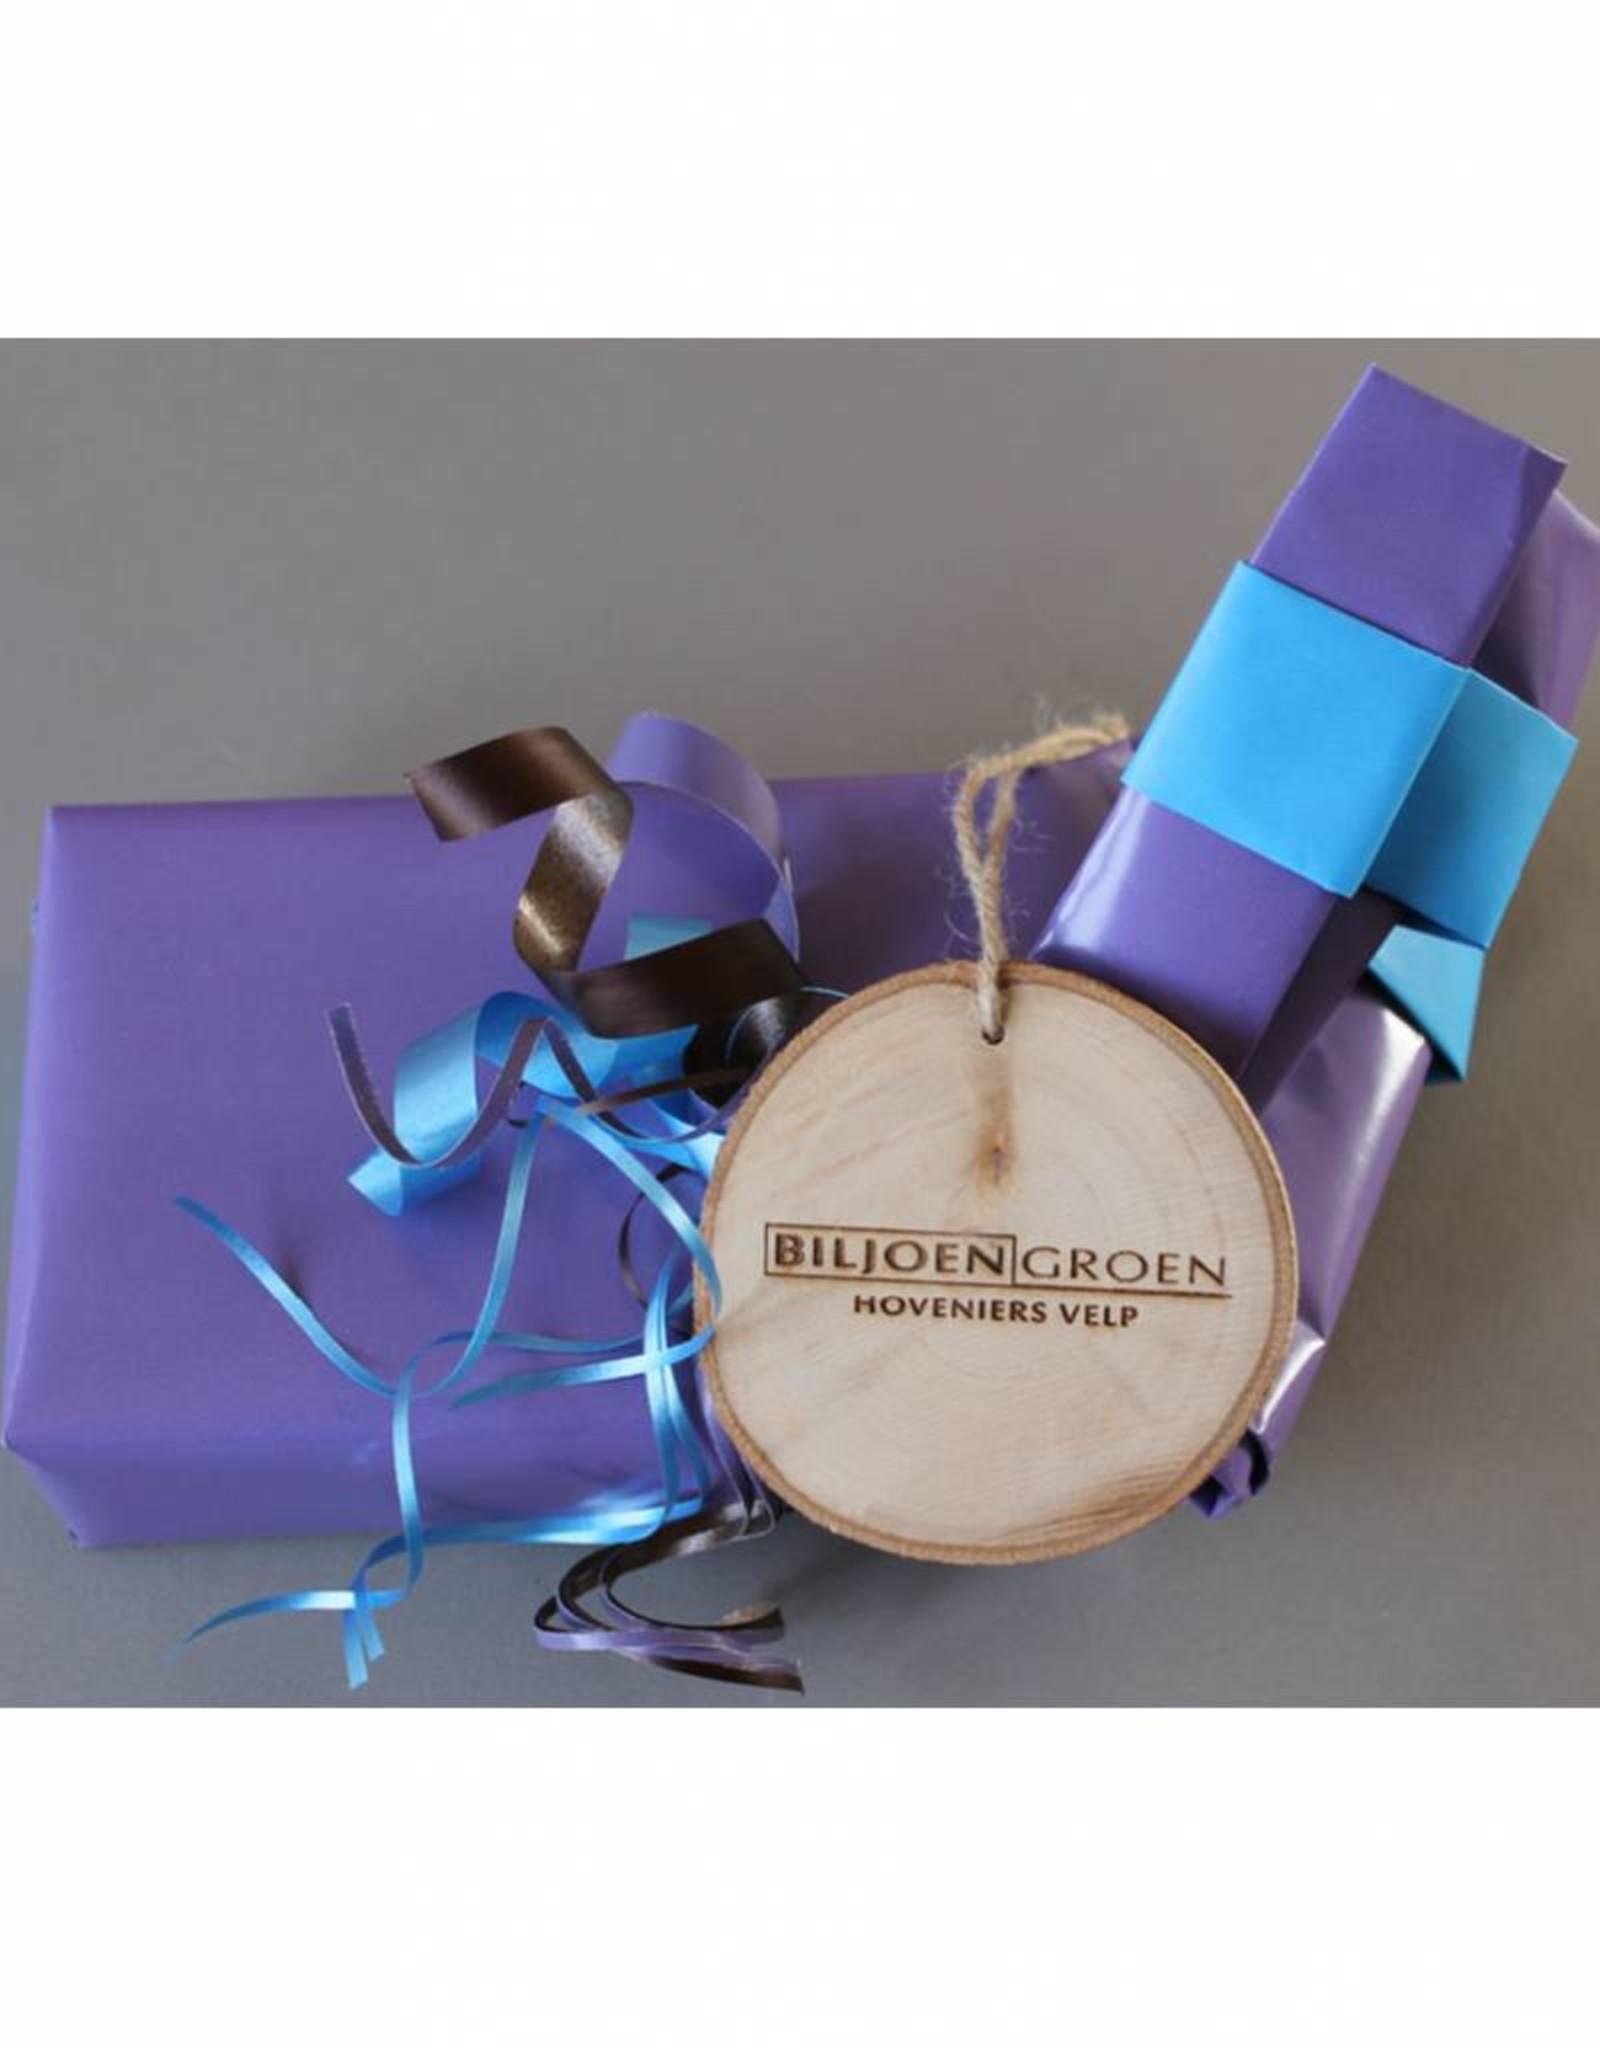 Houten cadeau-label - met bedrijfsnaam / logo